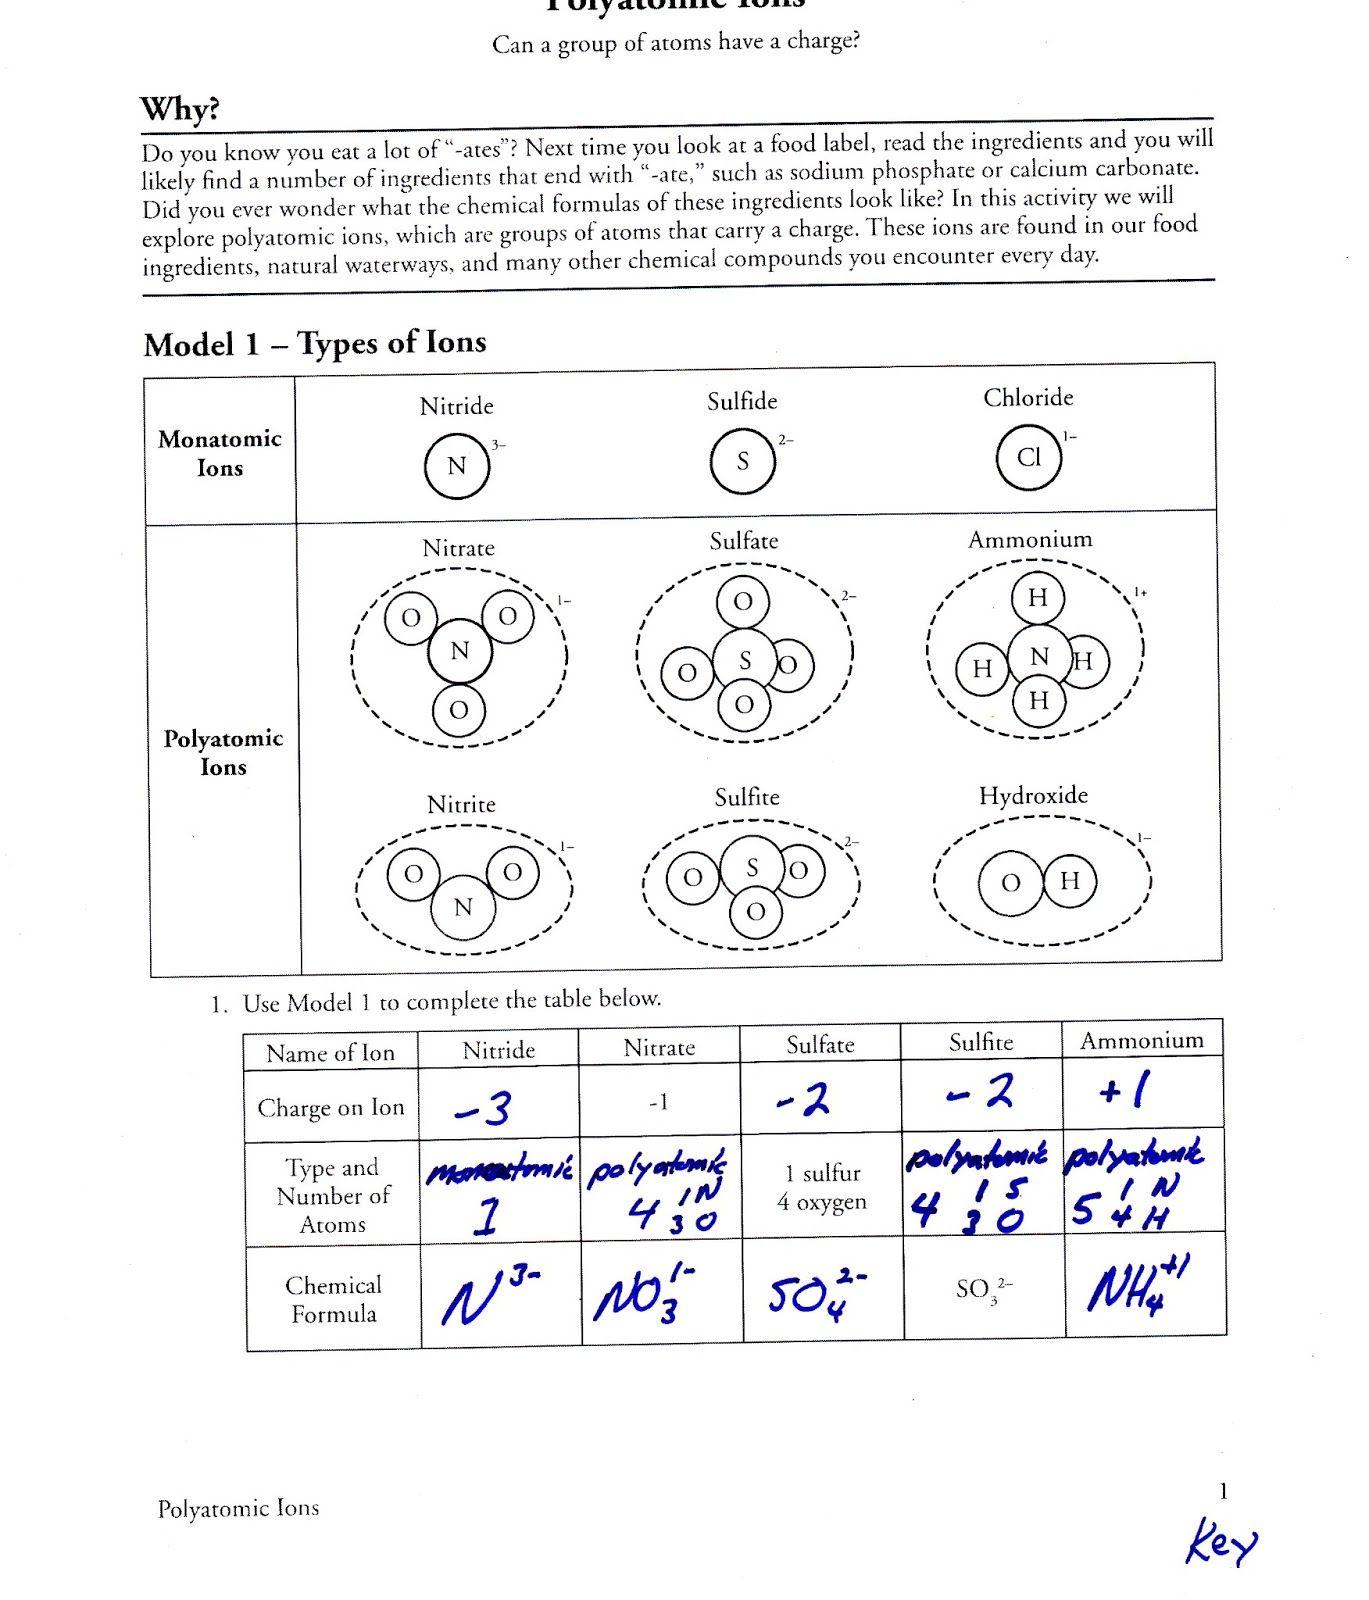 Polyatomic Ions Worksheet Answers Nice Plastic Surgery